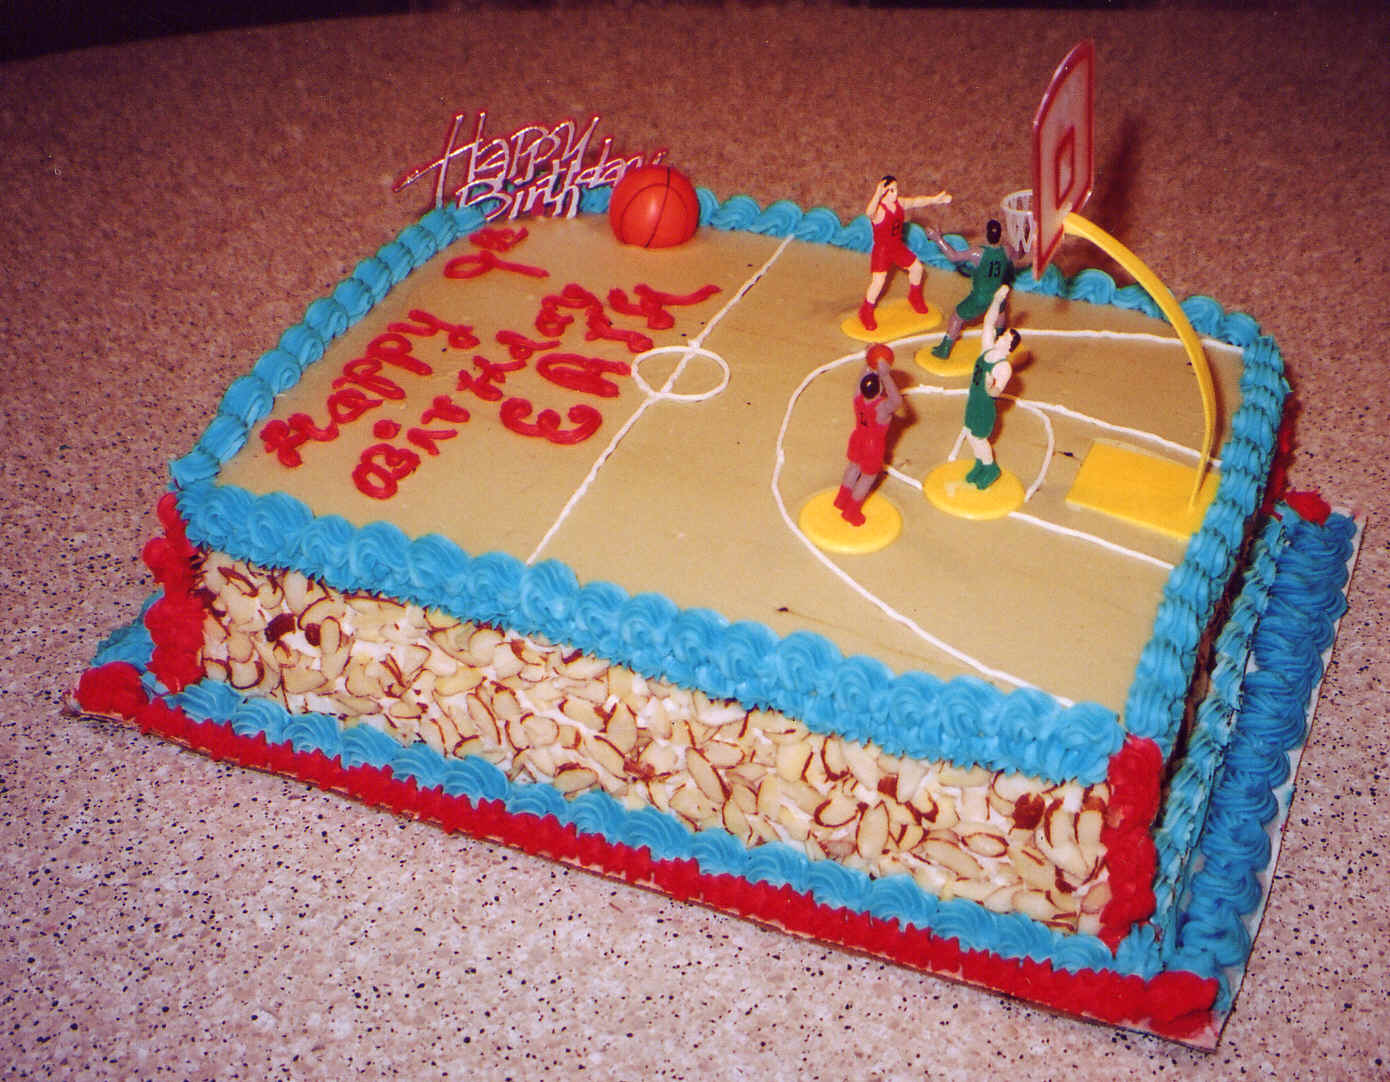 Prime Basketball Cakes Decoration Ideas Little Birthday Cakes Funny Birthday Cards Online Kookostrdamsfinfo